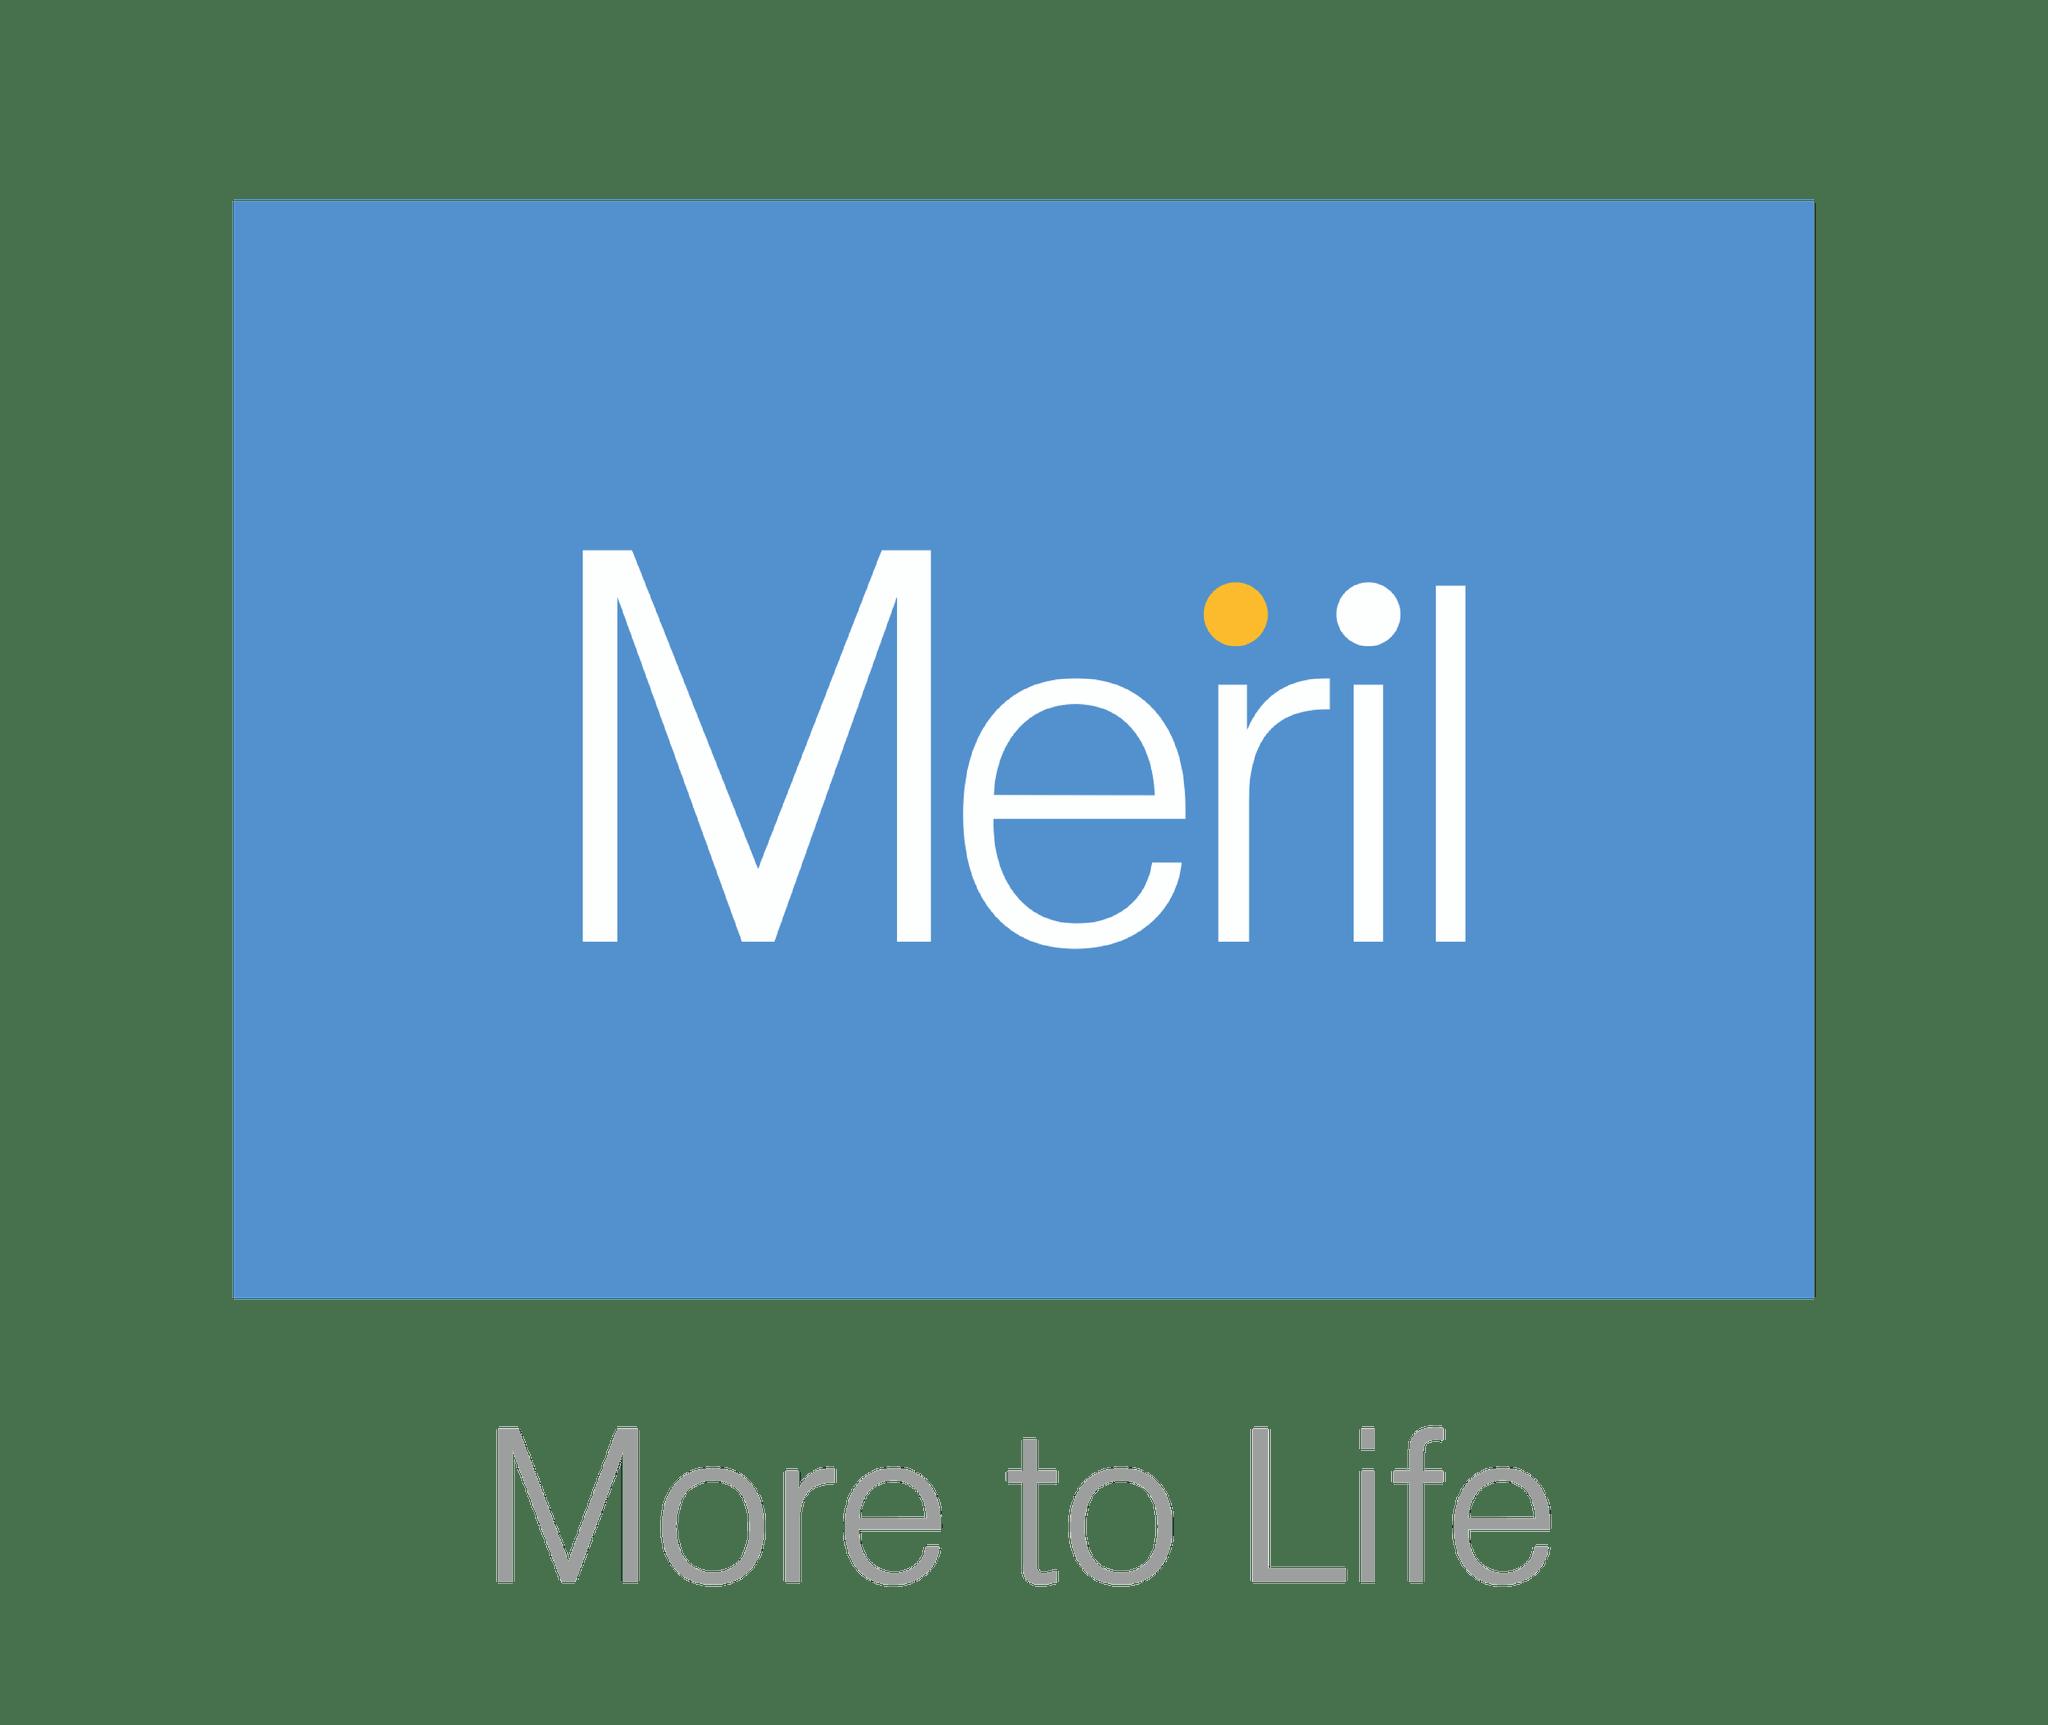 Meril Life